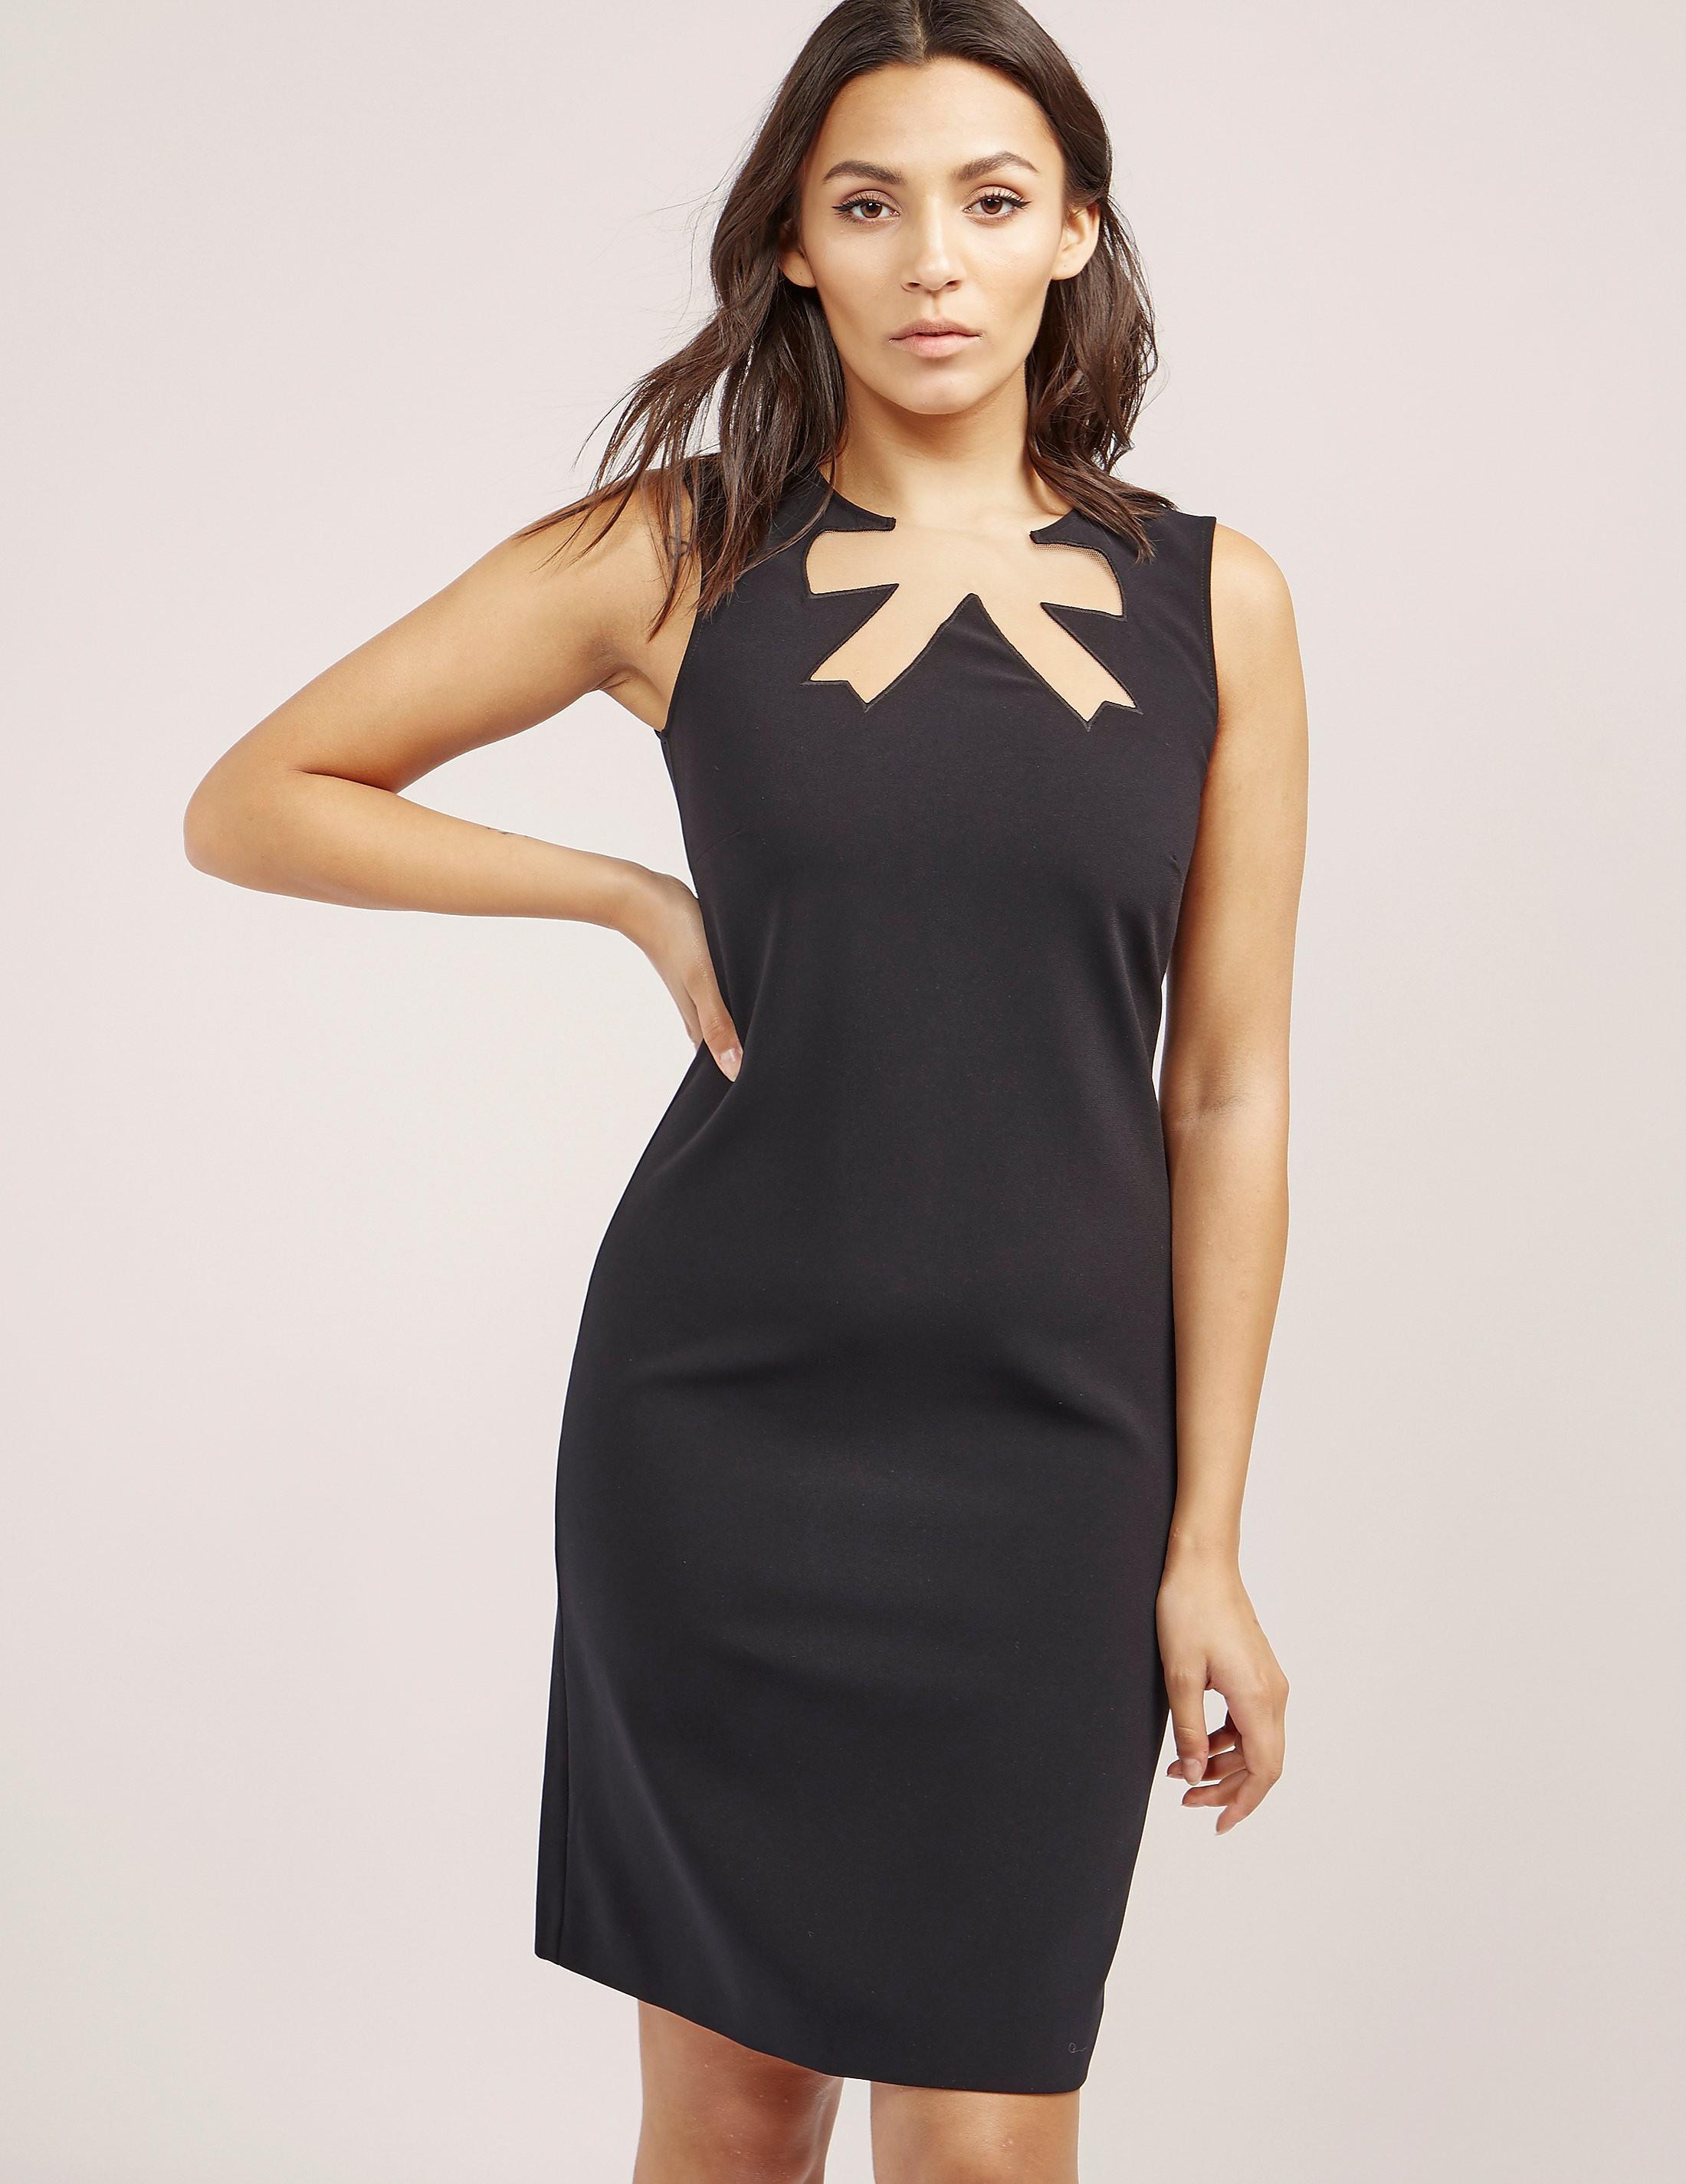 Love Moschino Bow Detail Dress